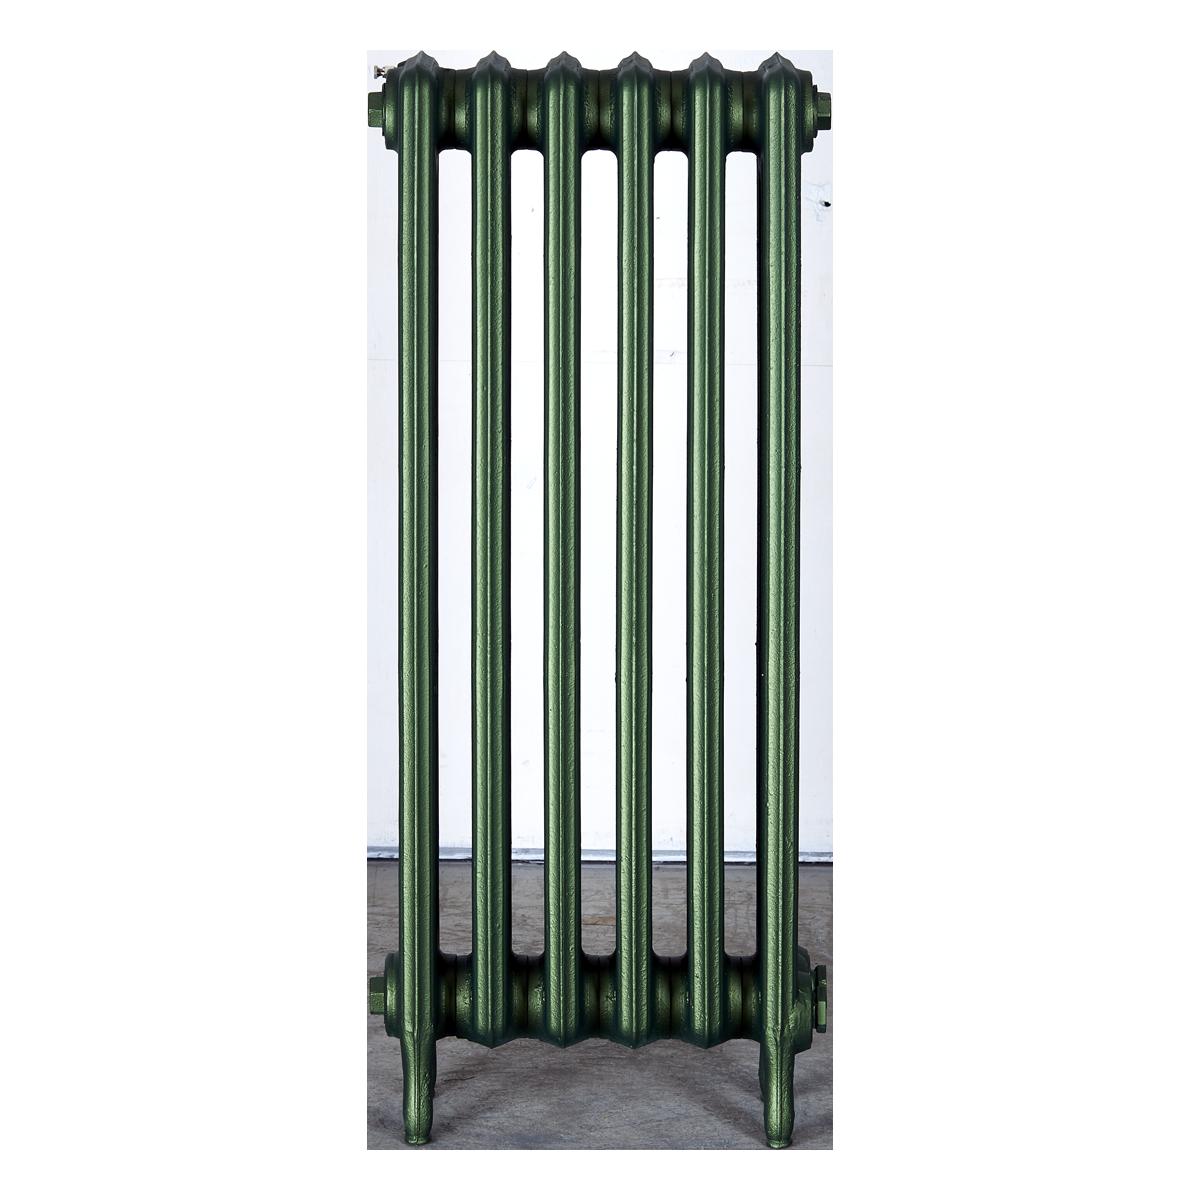 Ironworks Radiators Inc. refurbished cast iron radiator Havenlea in Hunter Green